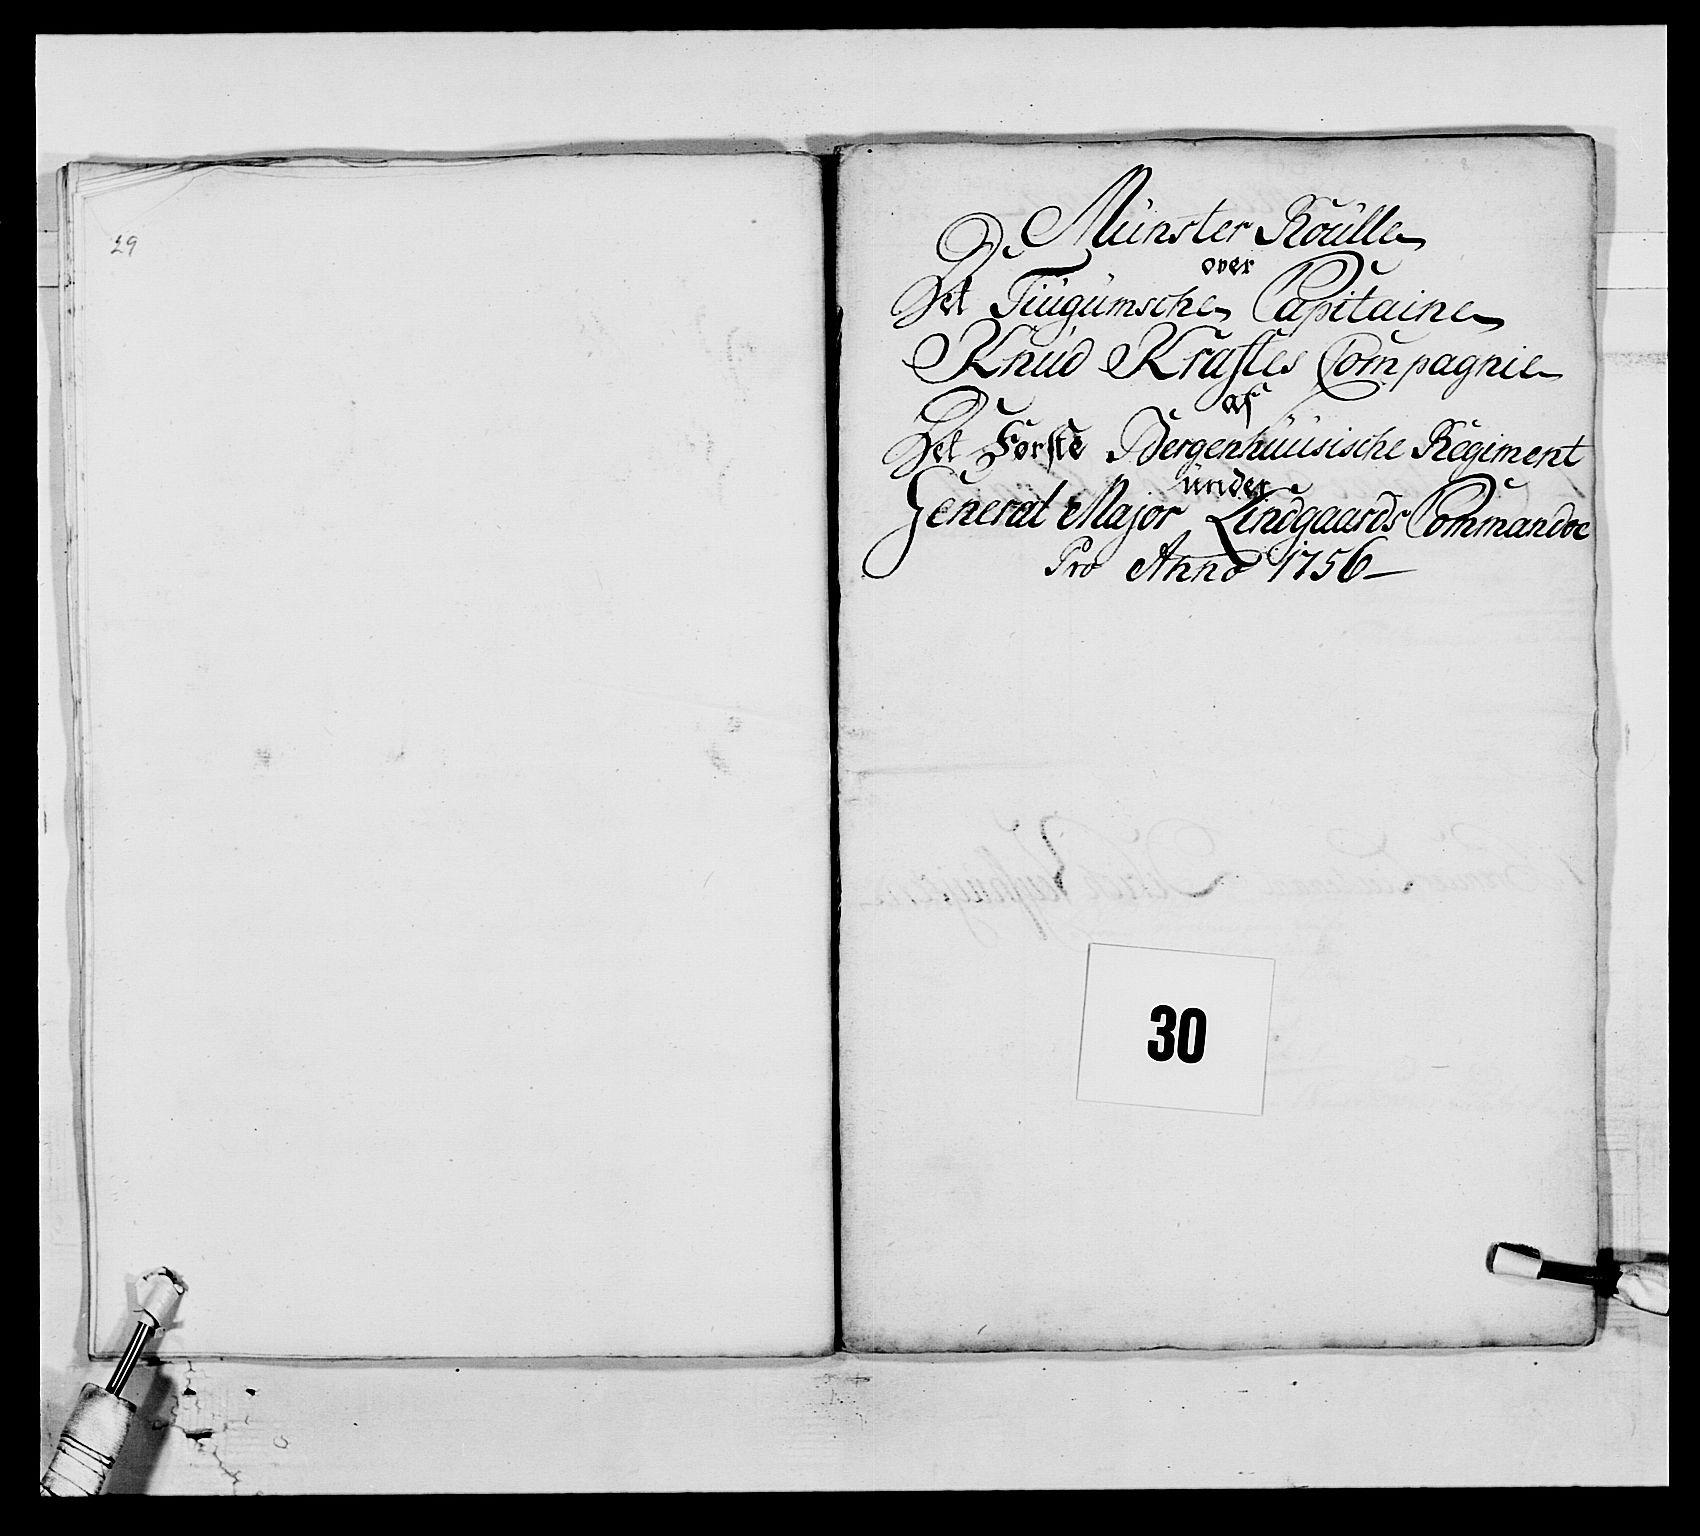 RA, Kommanderende general (KG I) med Det norske krigsdirektorium, E/Ea/L0517: 1. Bergenhusiske regiment, 1742-1756, s. 468